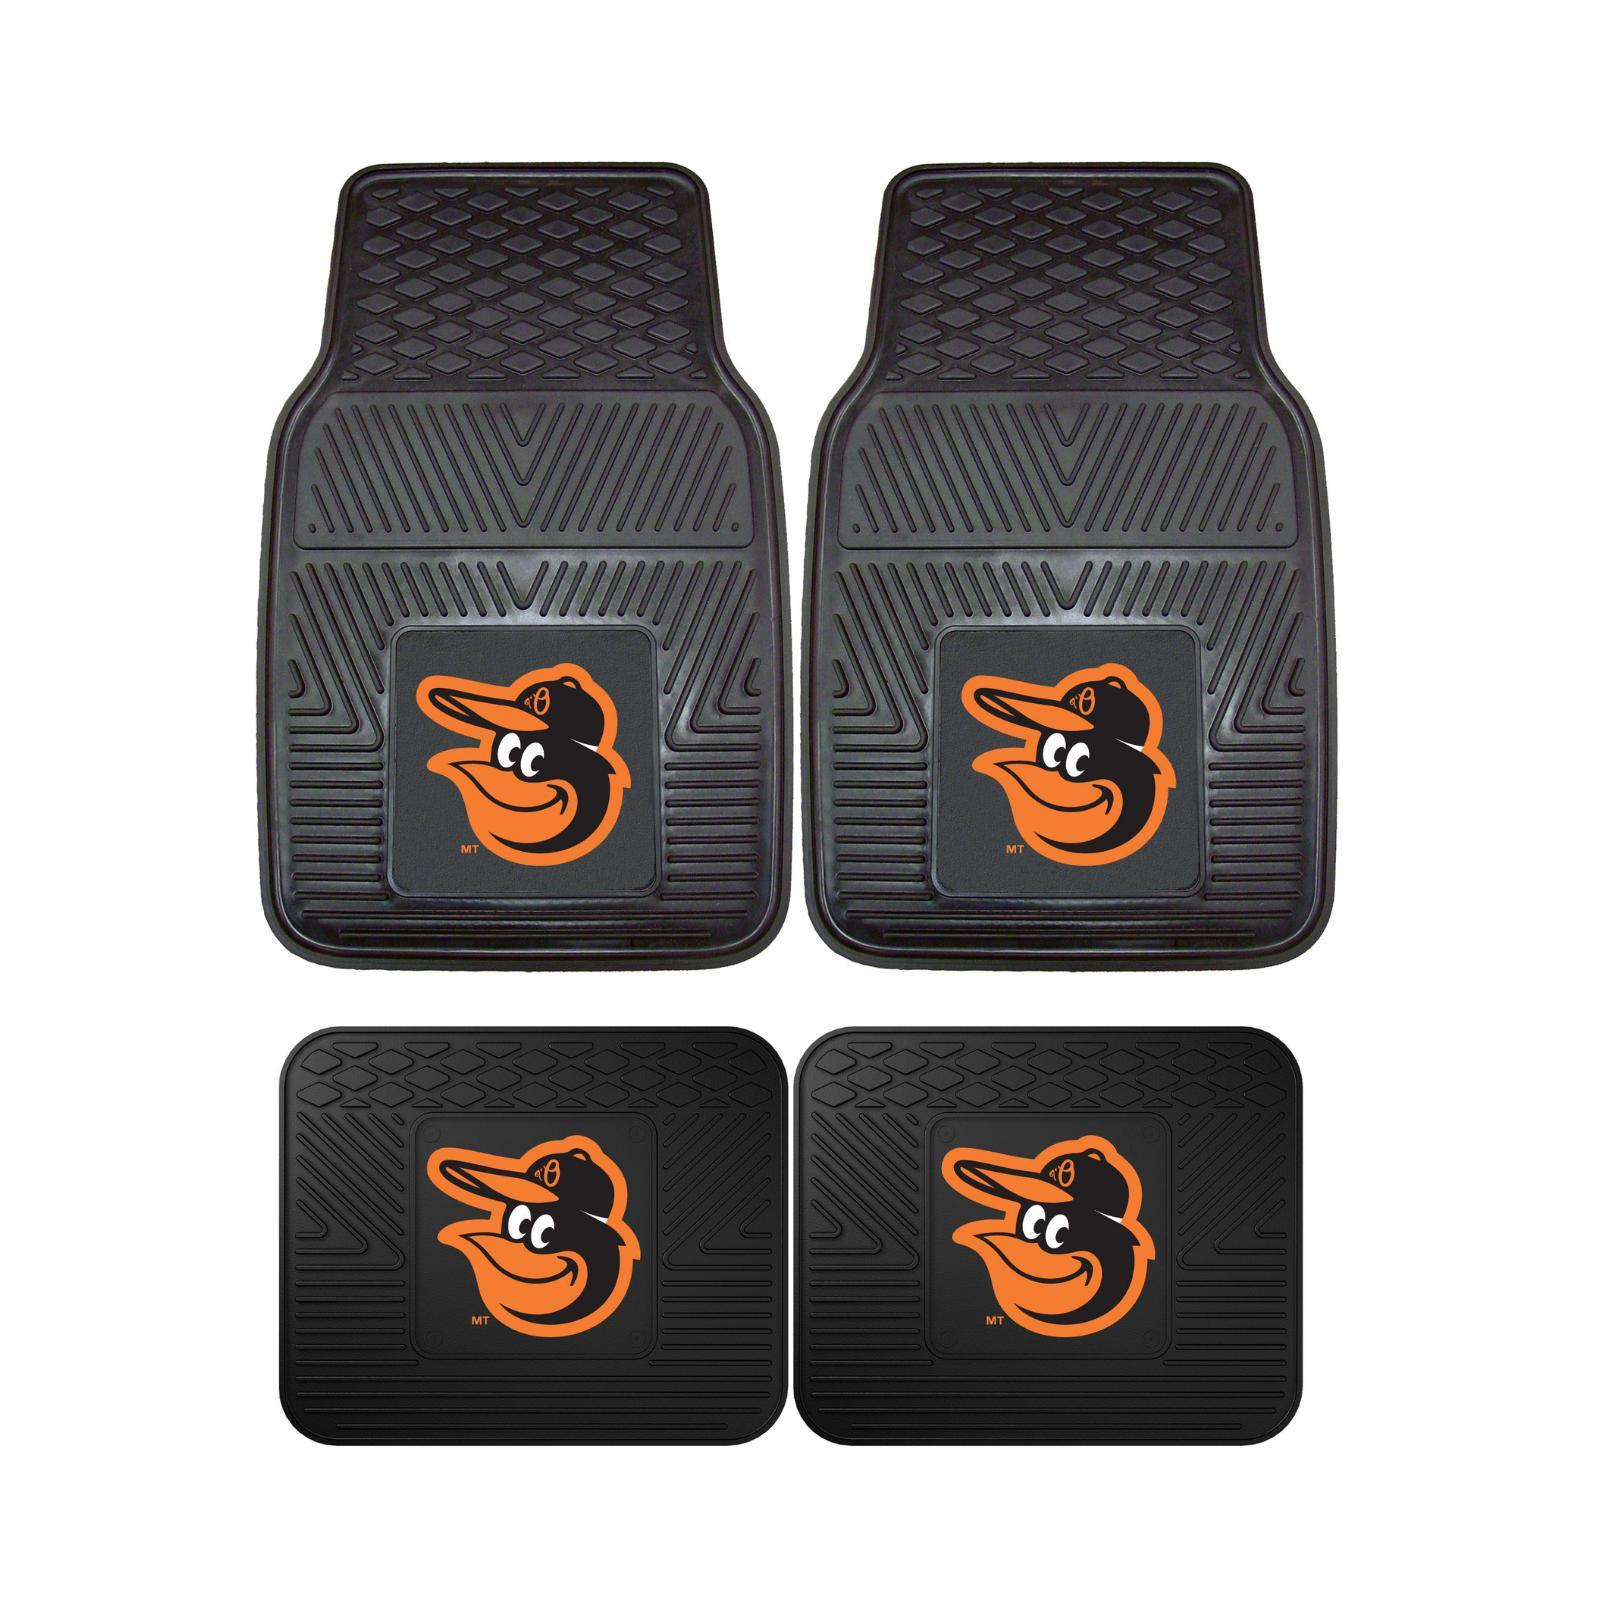 Baltimore Orioles Car Front Rear Floor Set Seat